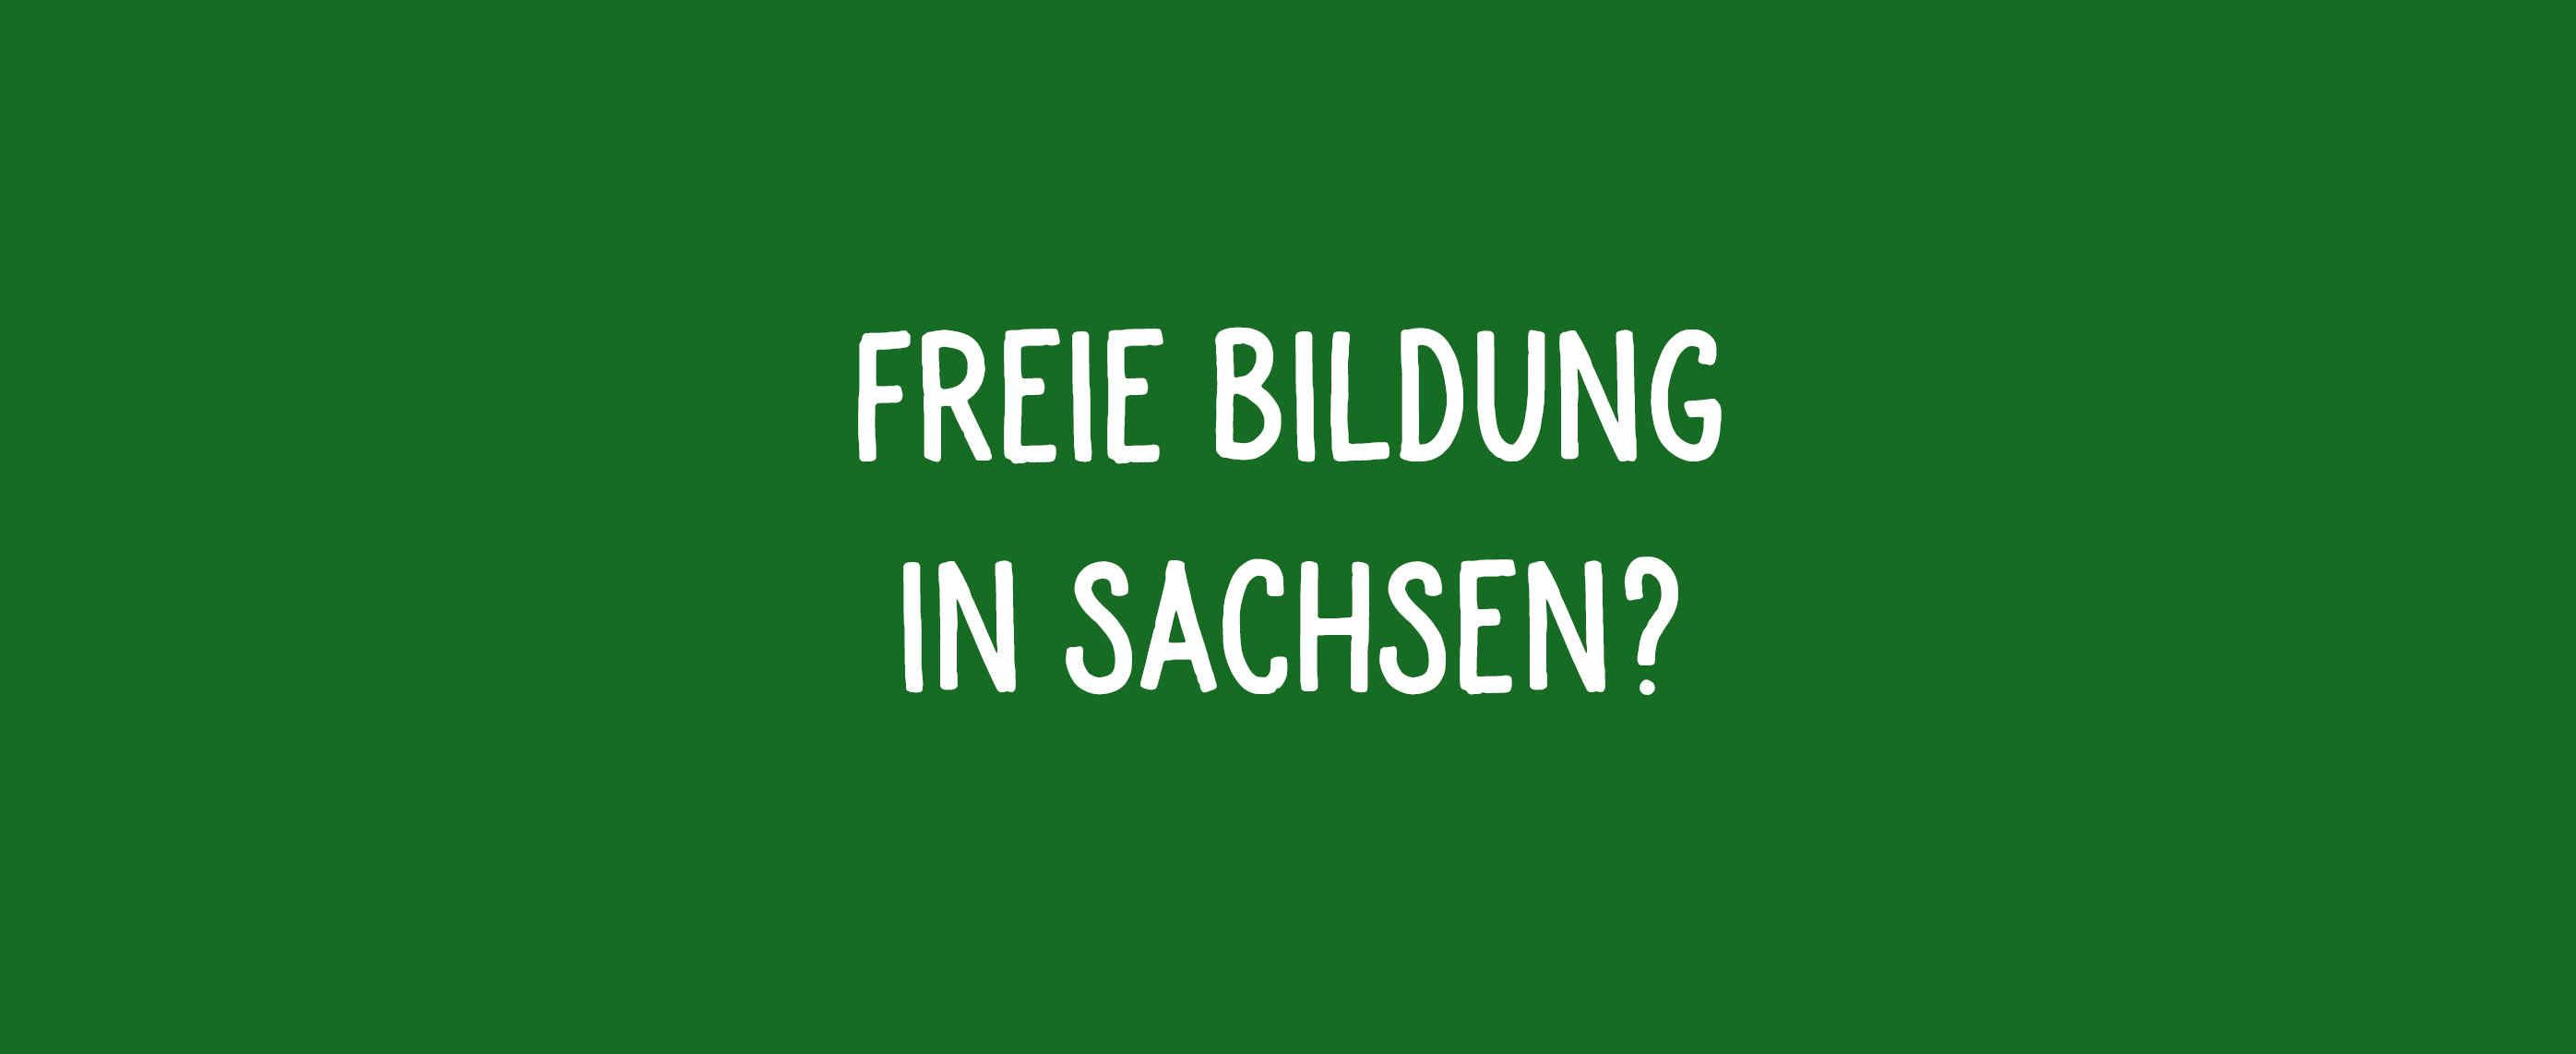 Landtagswahl in Sachsen